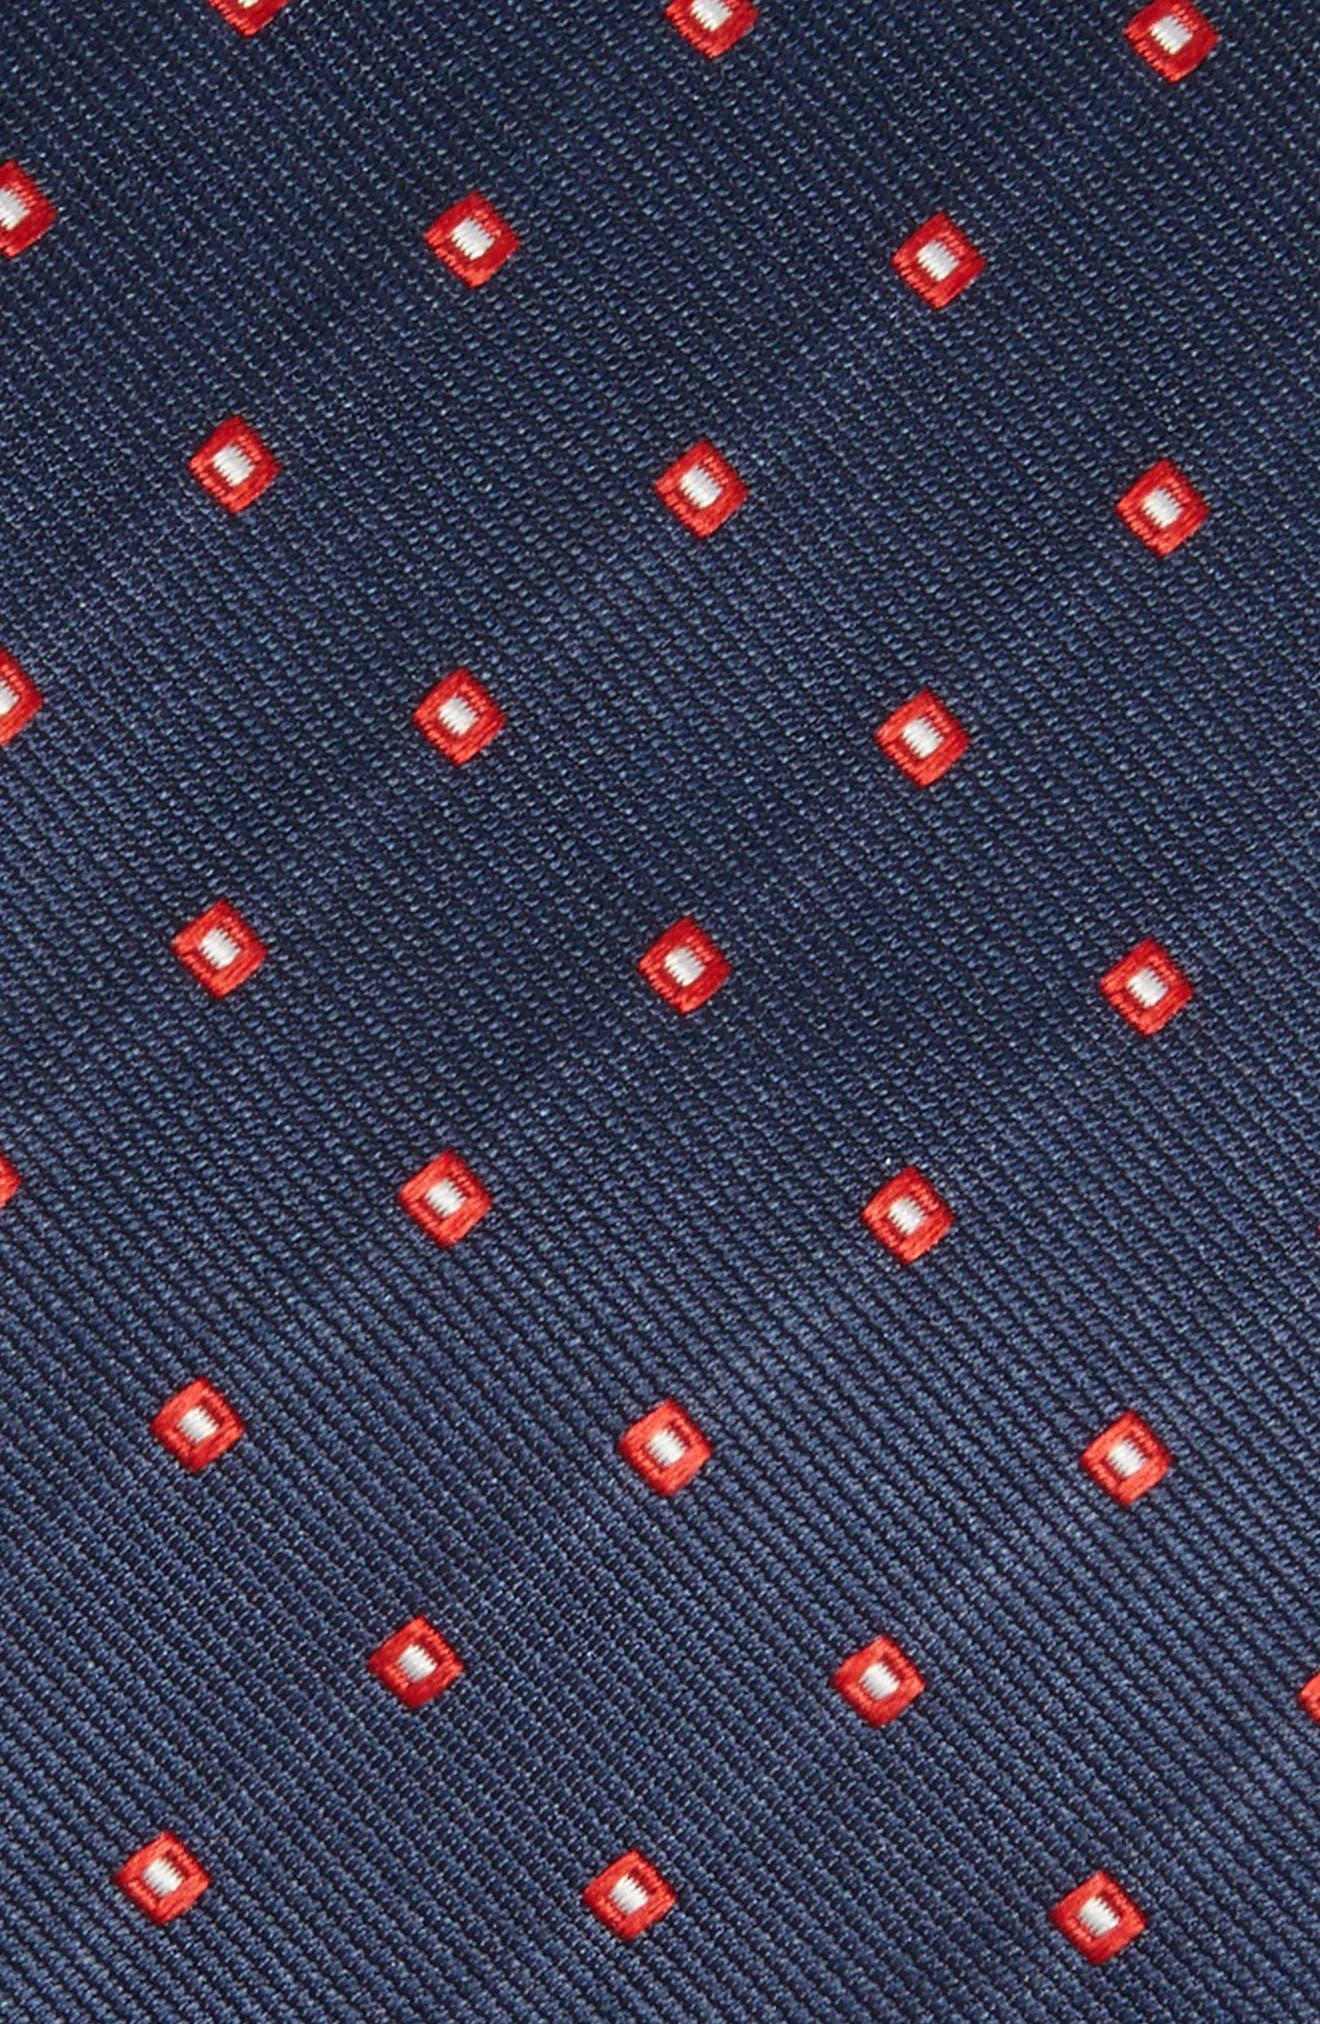 Medallion Silk Tie,                             Alternate thumbnail 2, color,                             Navy/ Red